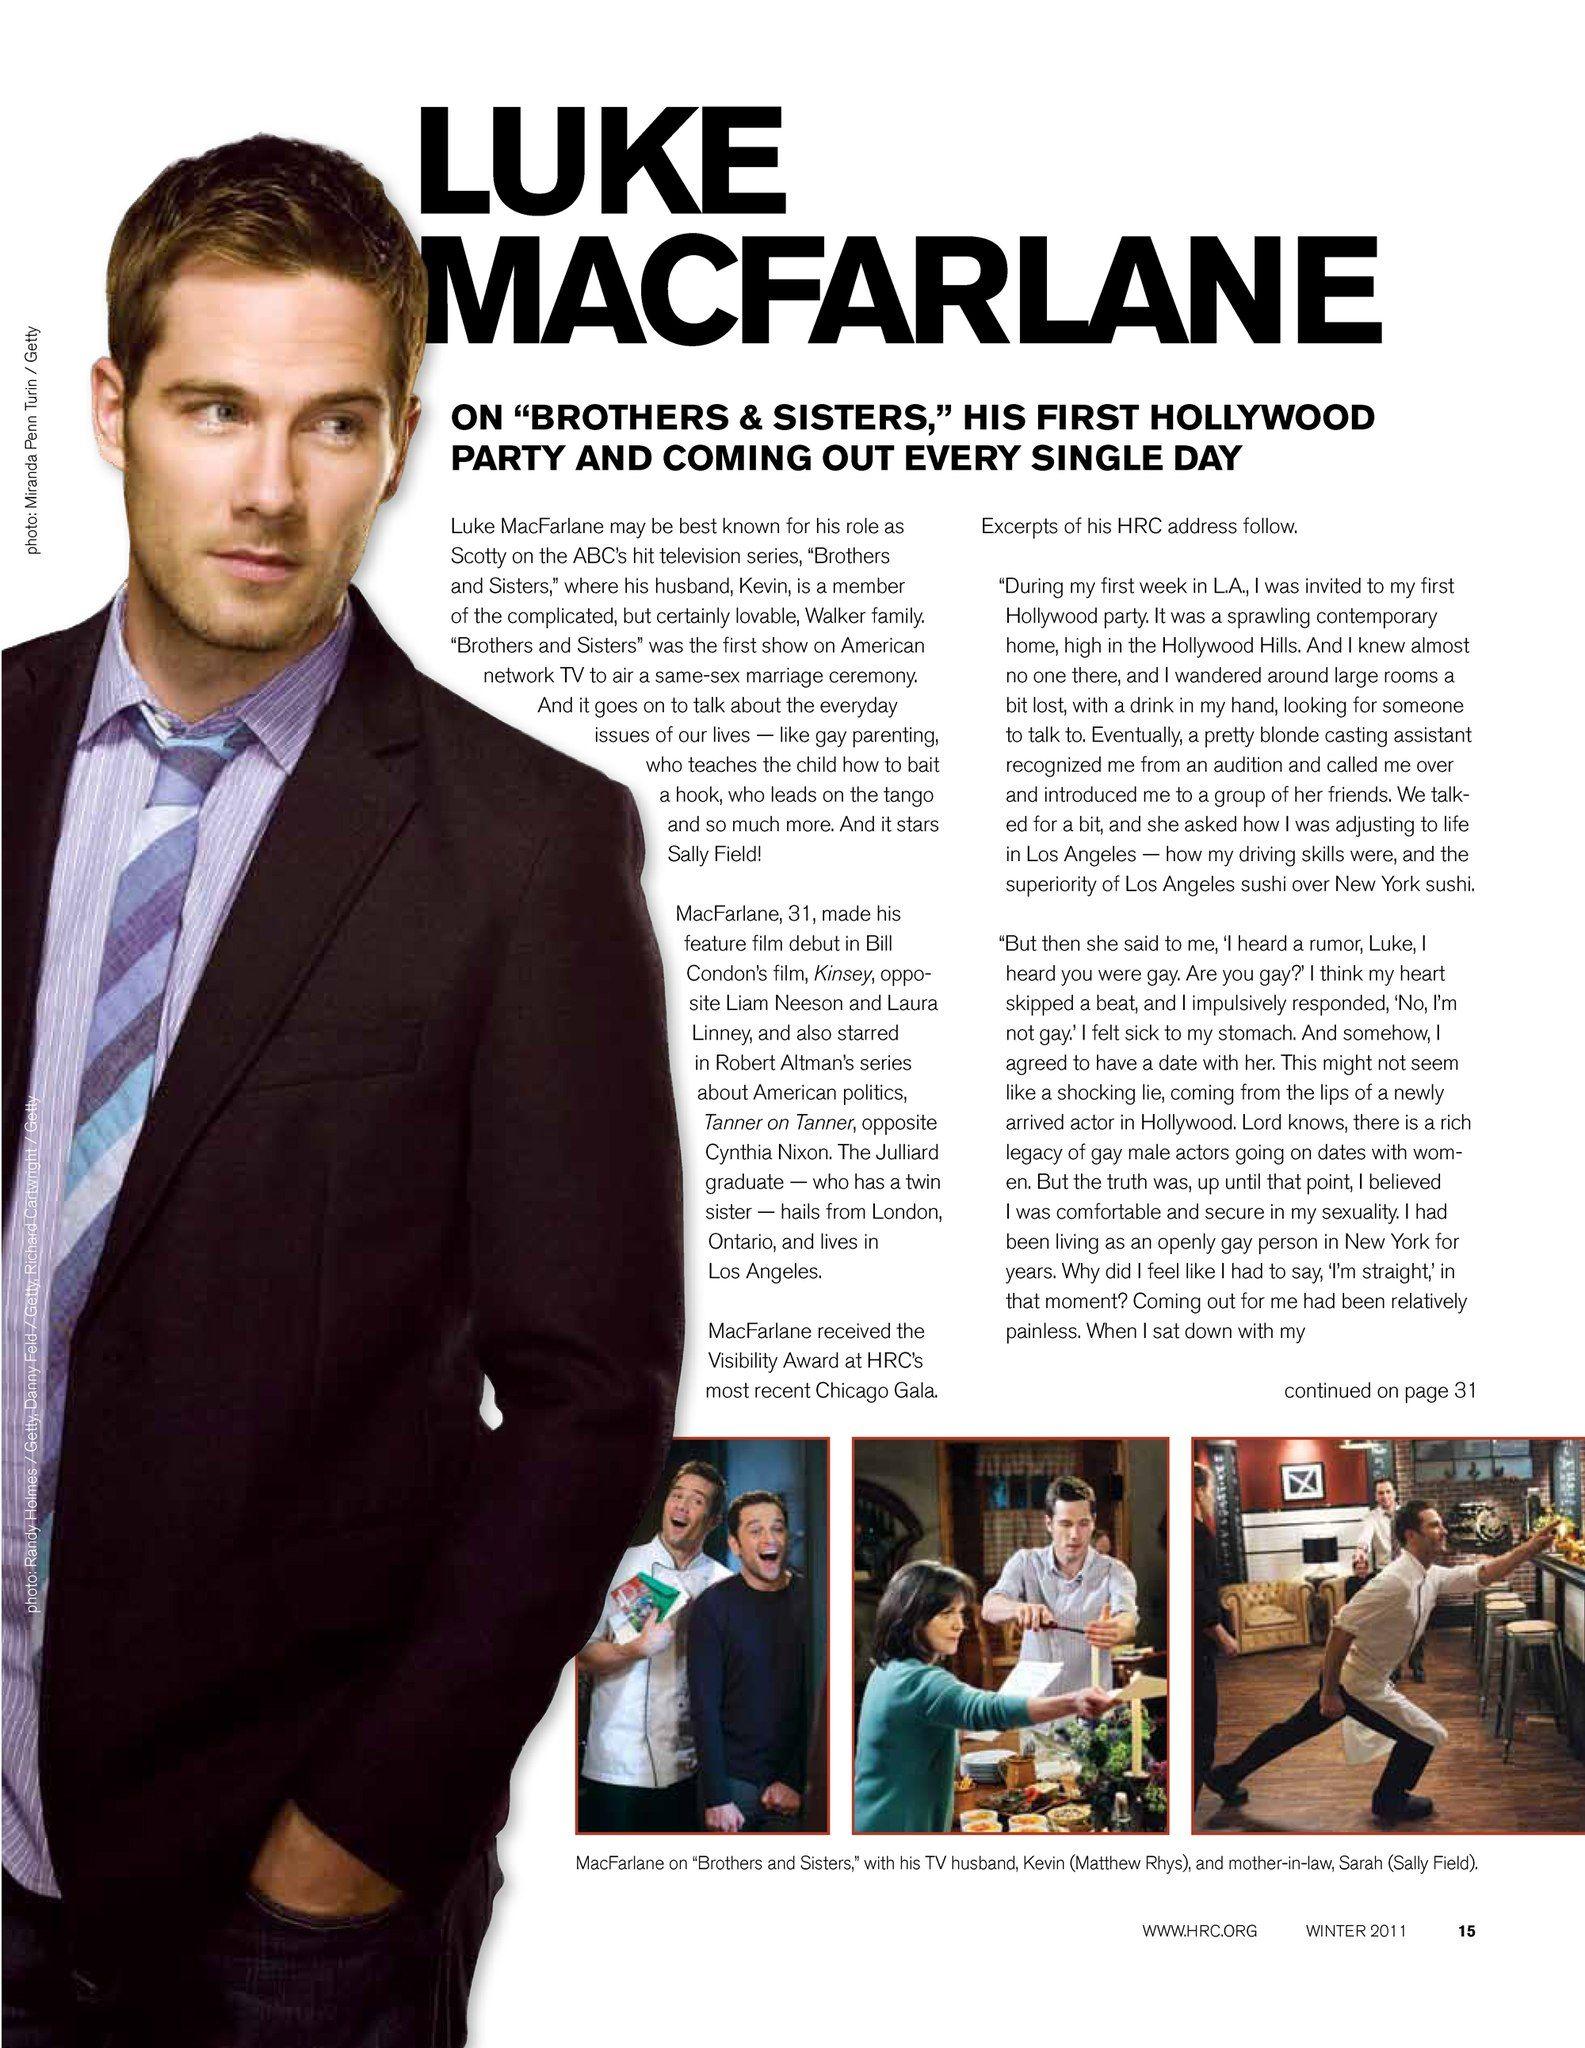 Luke macfarlane and boyfriend